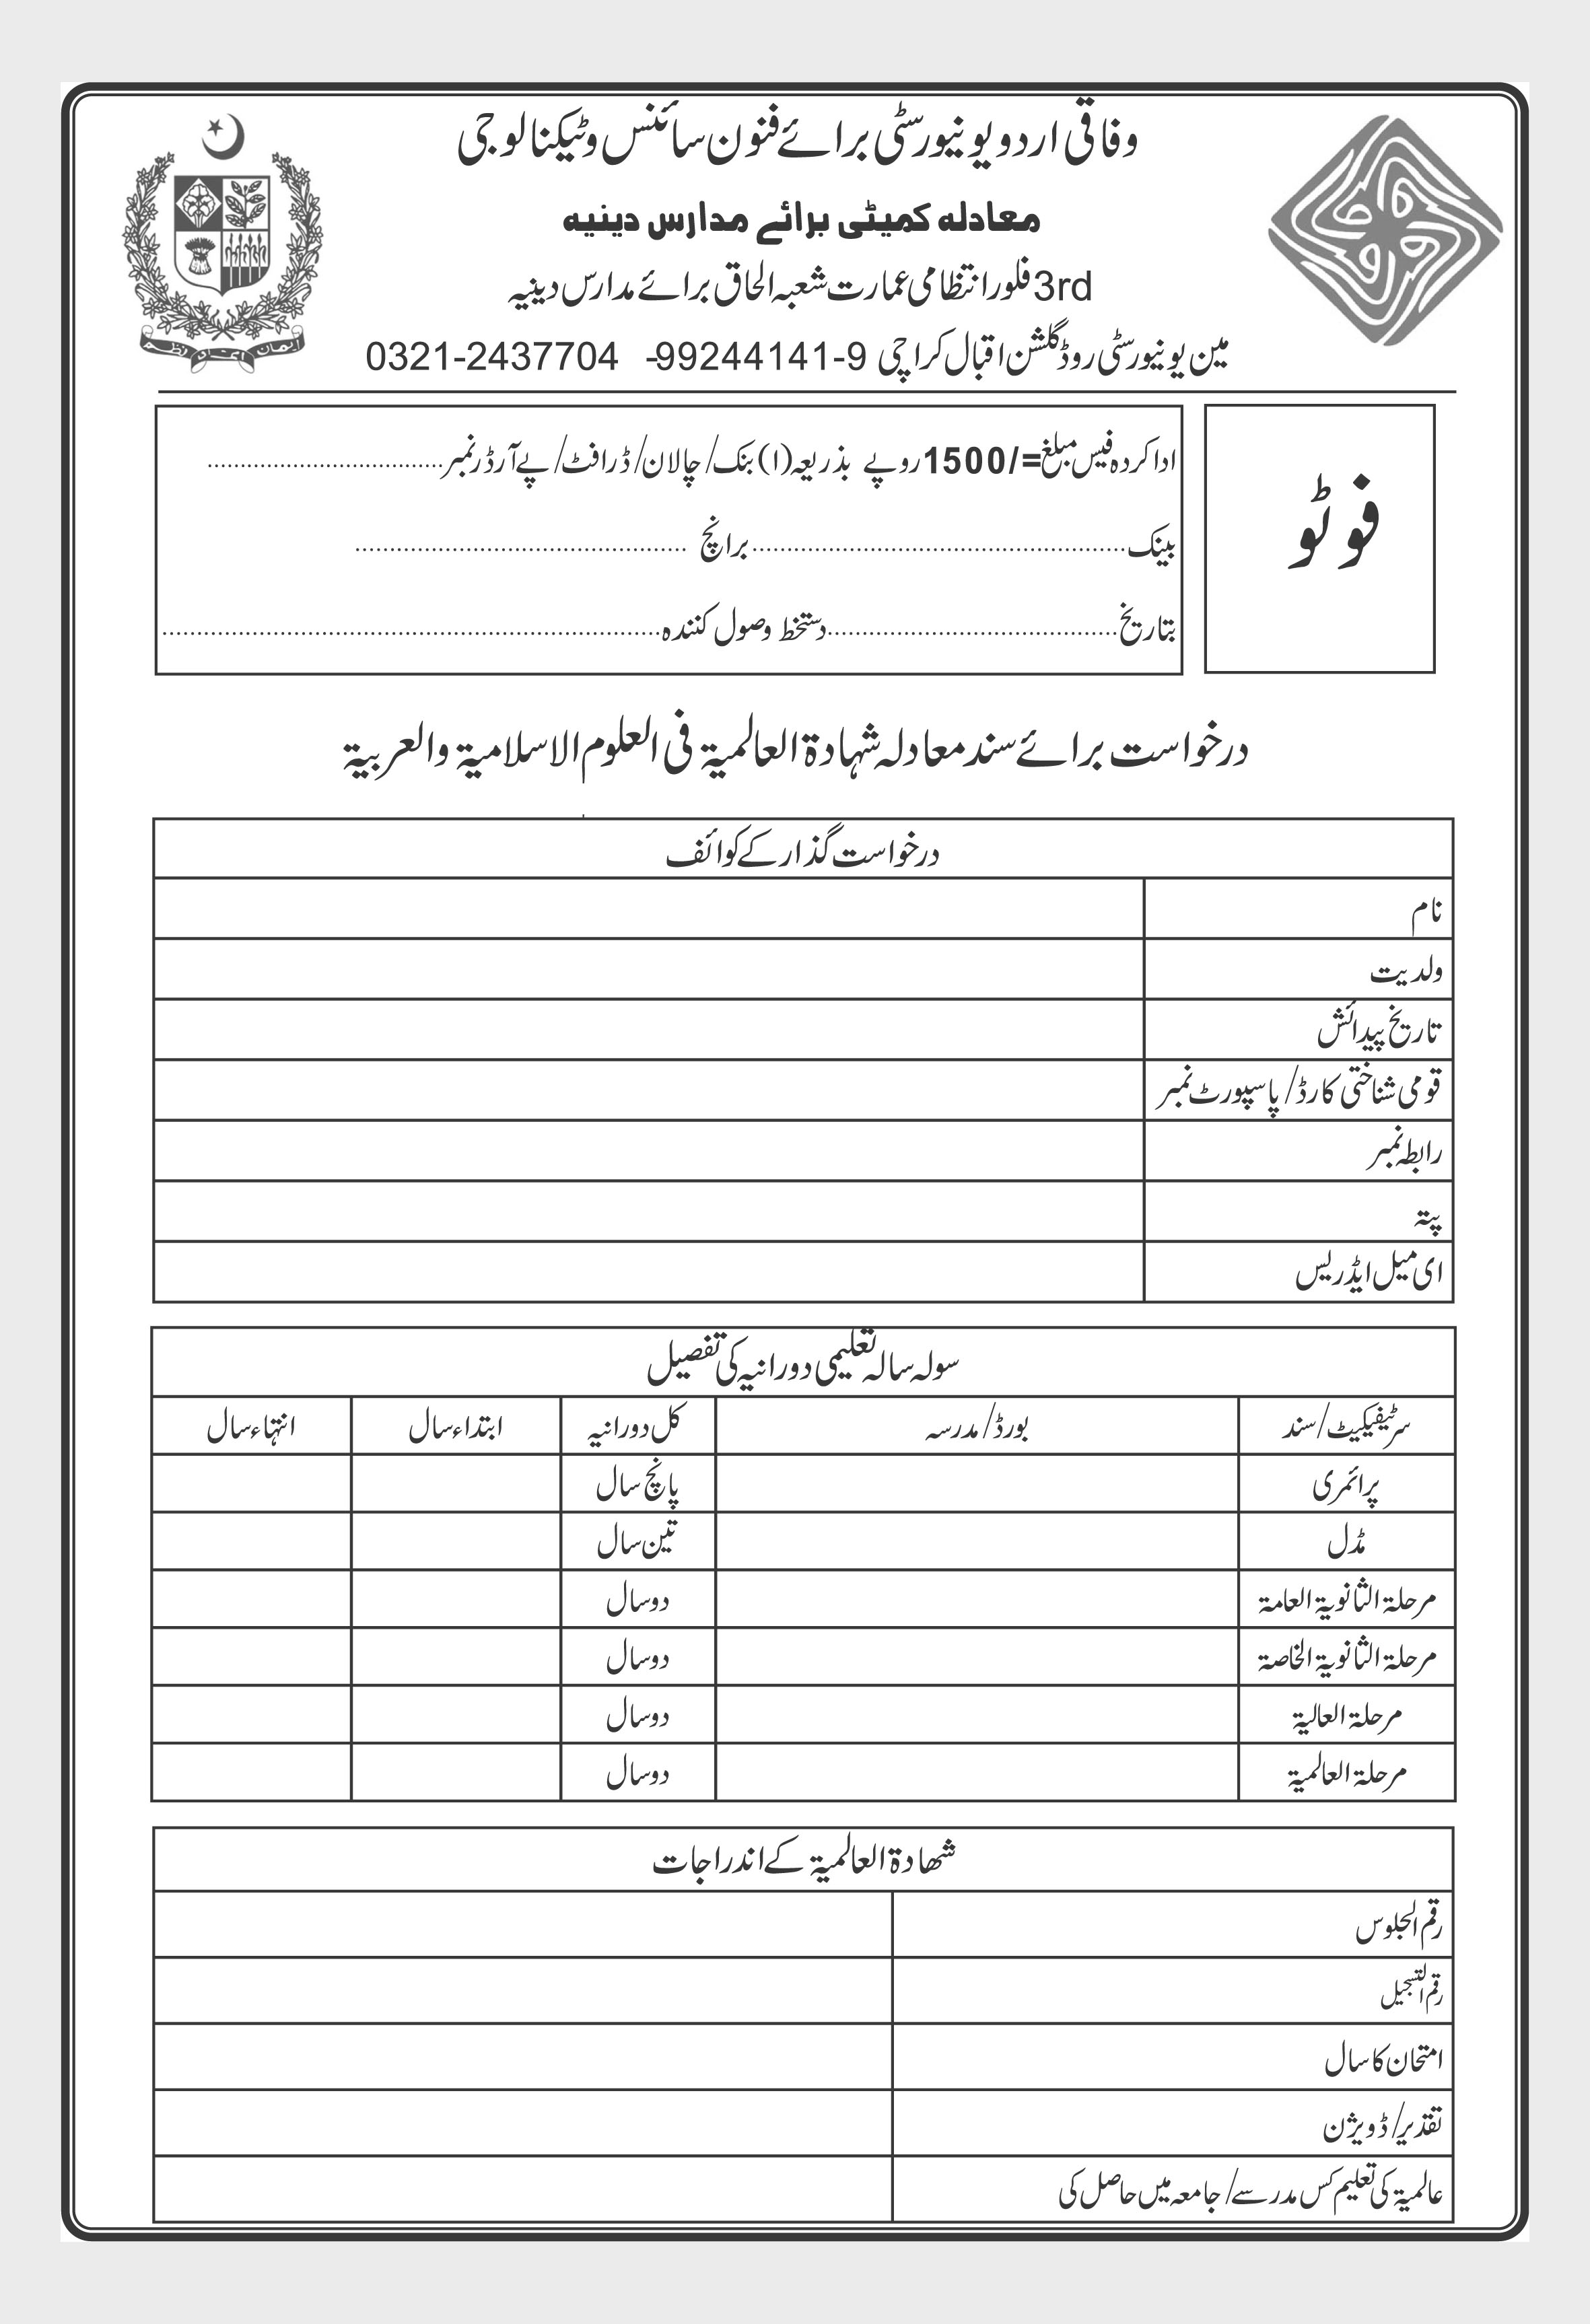 Affiliation Form – FUUAST